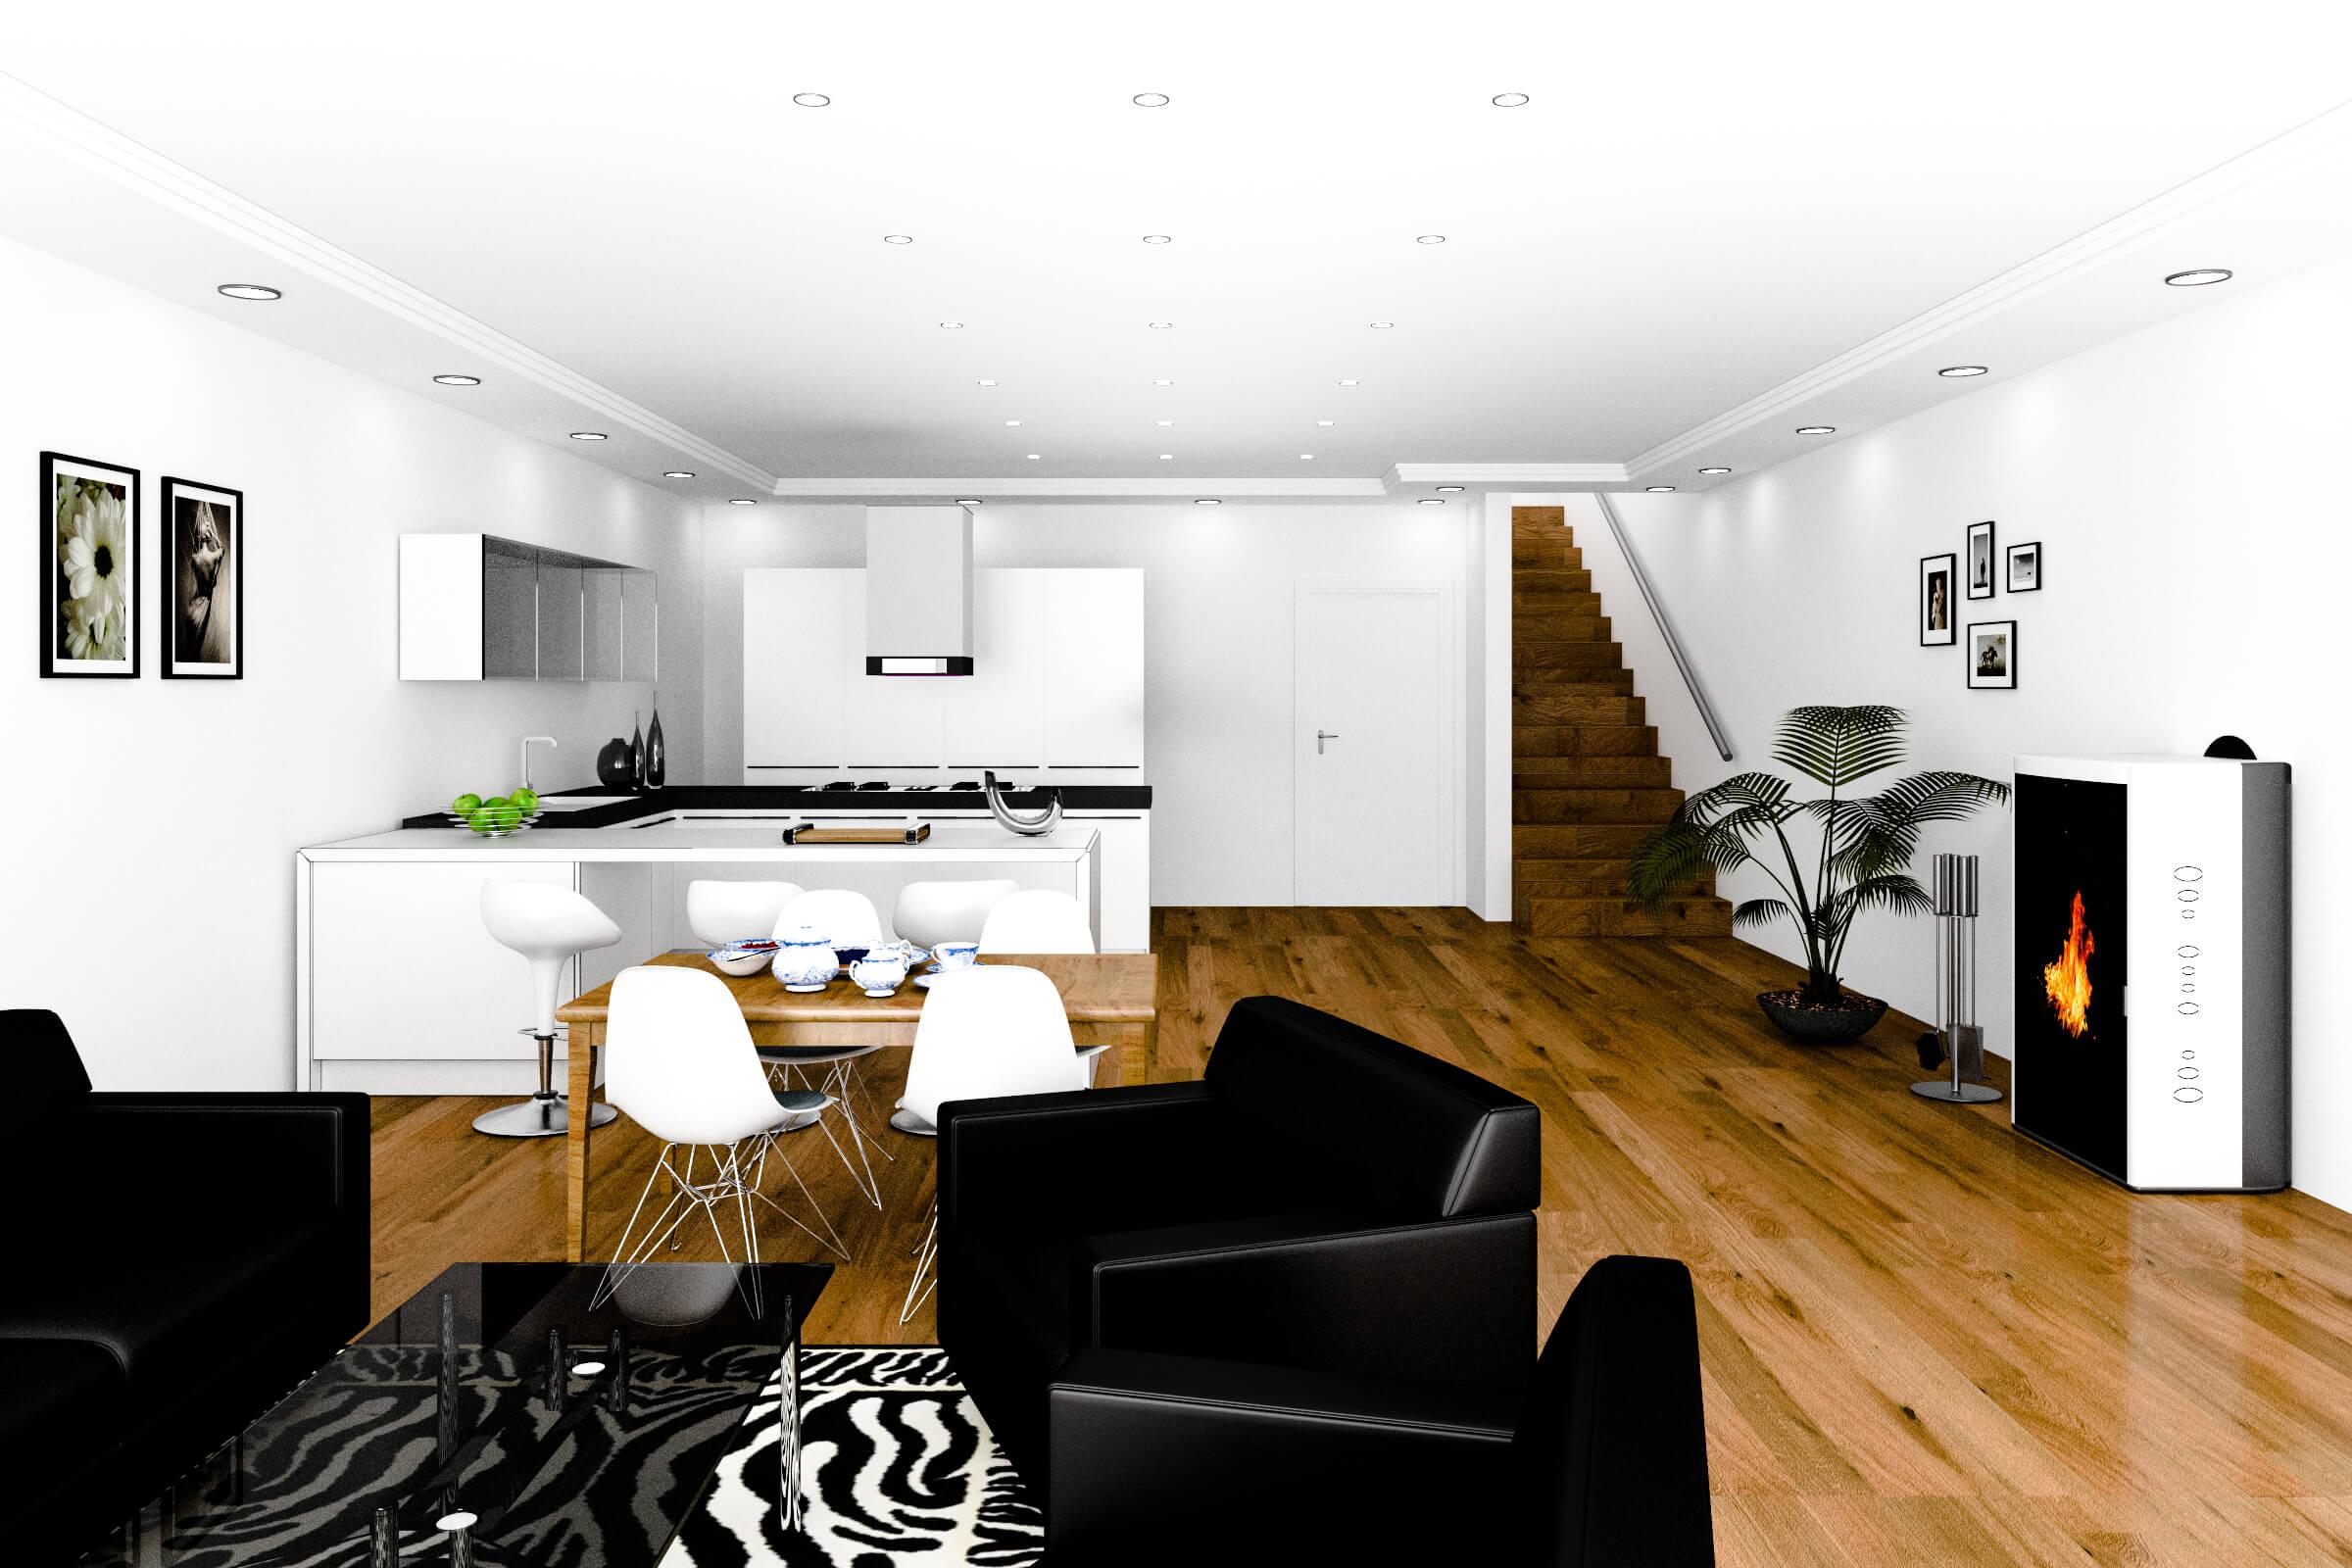 haus b 1a haus. Black Bedroom Furniture Sets. Home Design Ideas